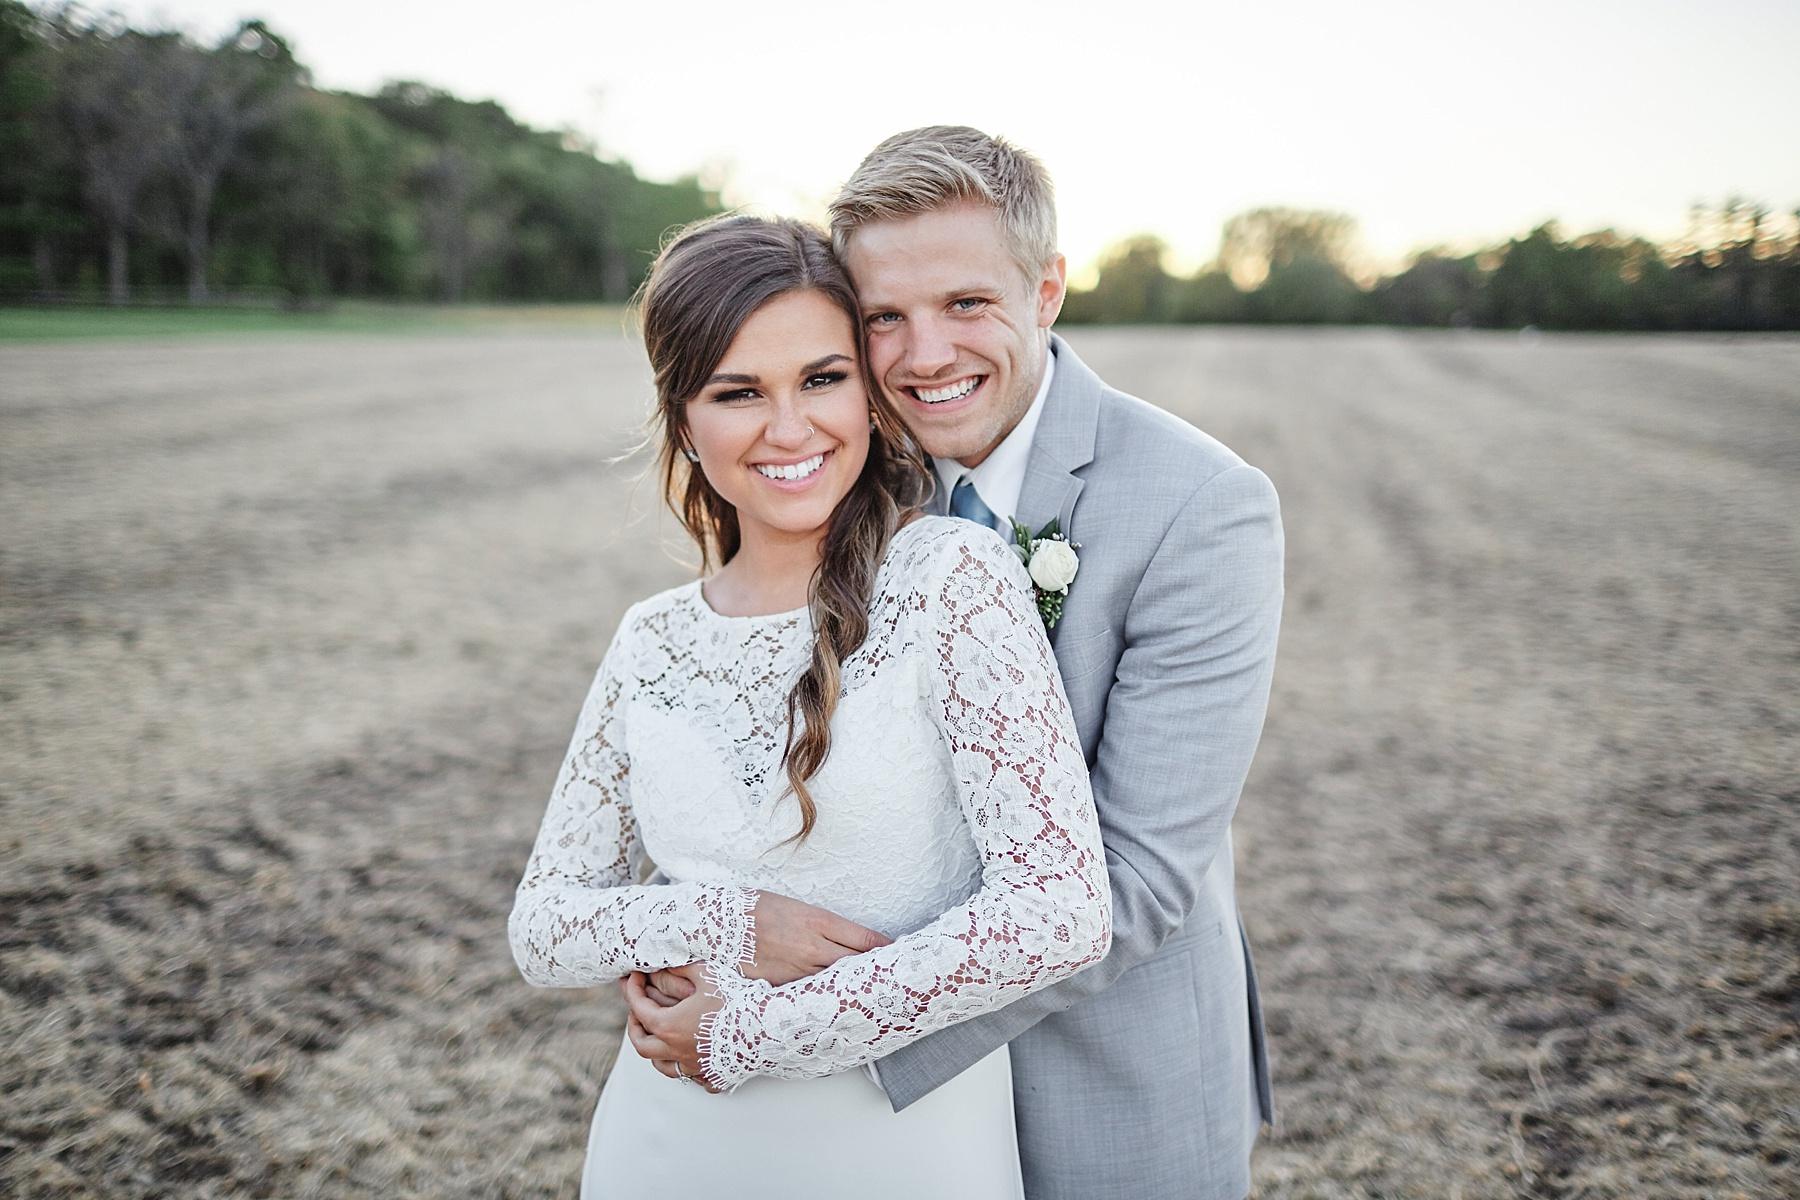 Maywood-Stone-Barn-Wedding-Rochester-Minnesota-Perry-James-Photo_0675.jpg